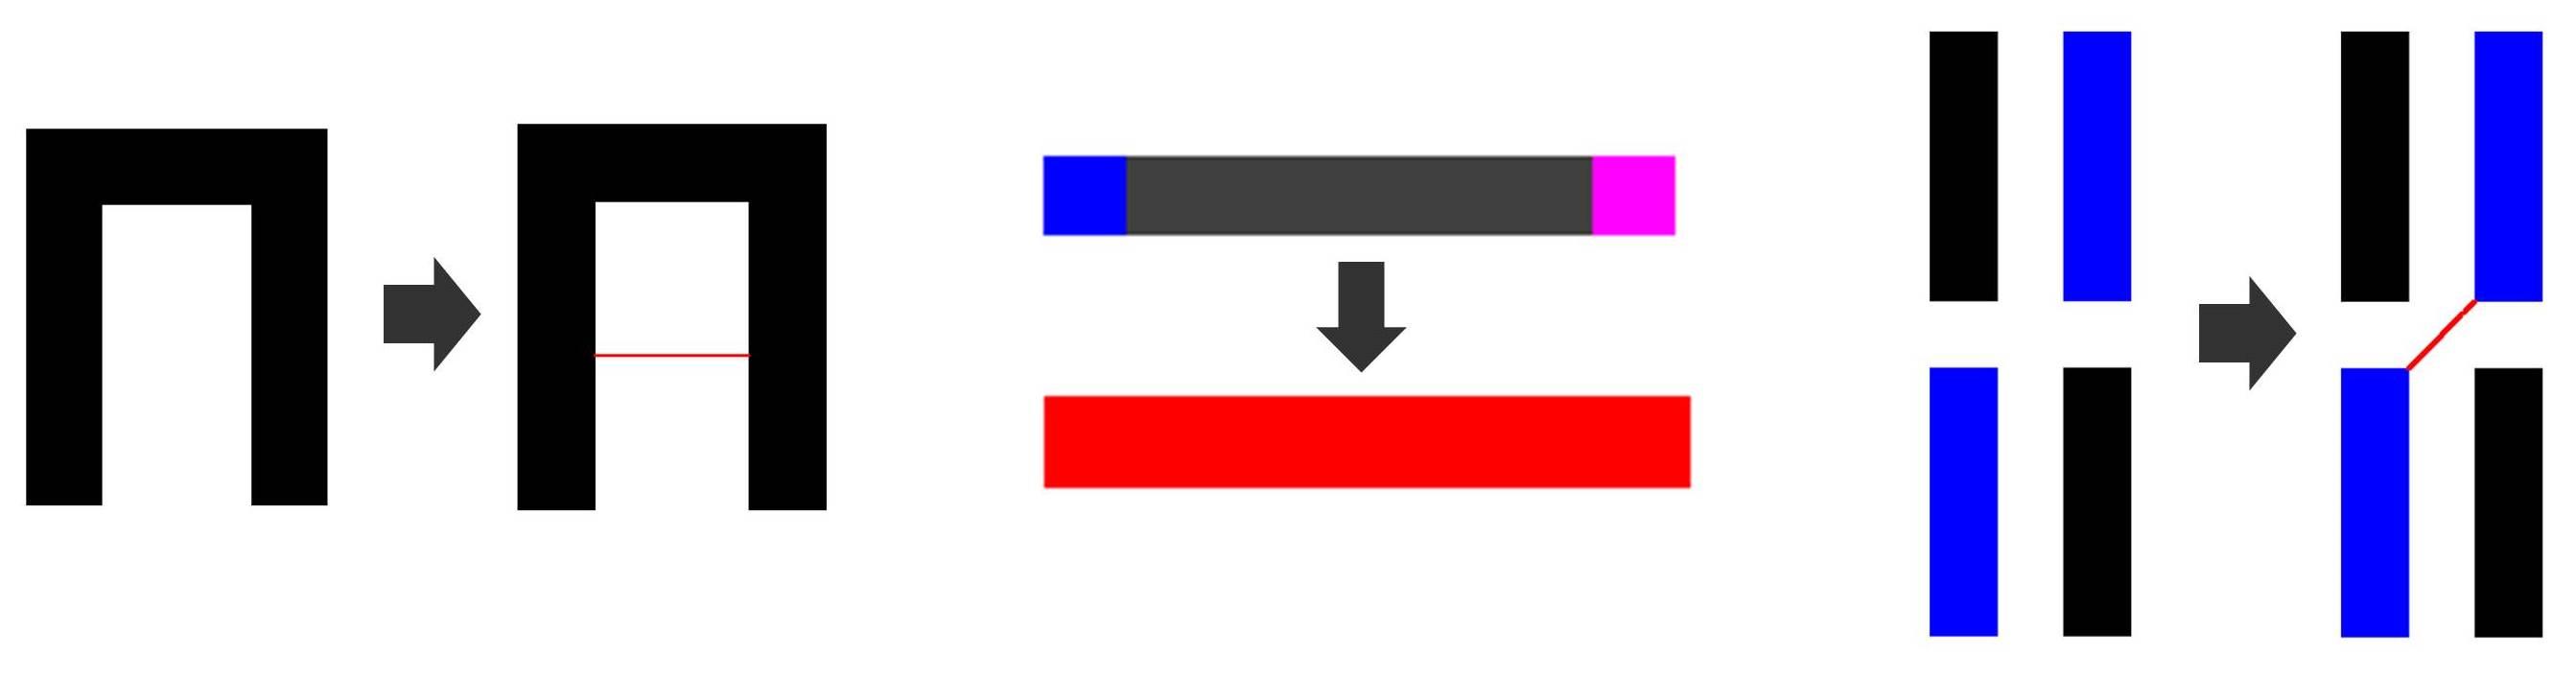 Mentor blog Figure 4